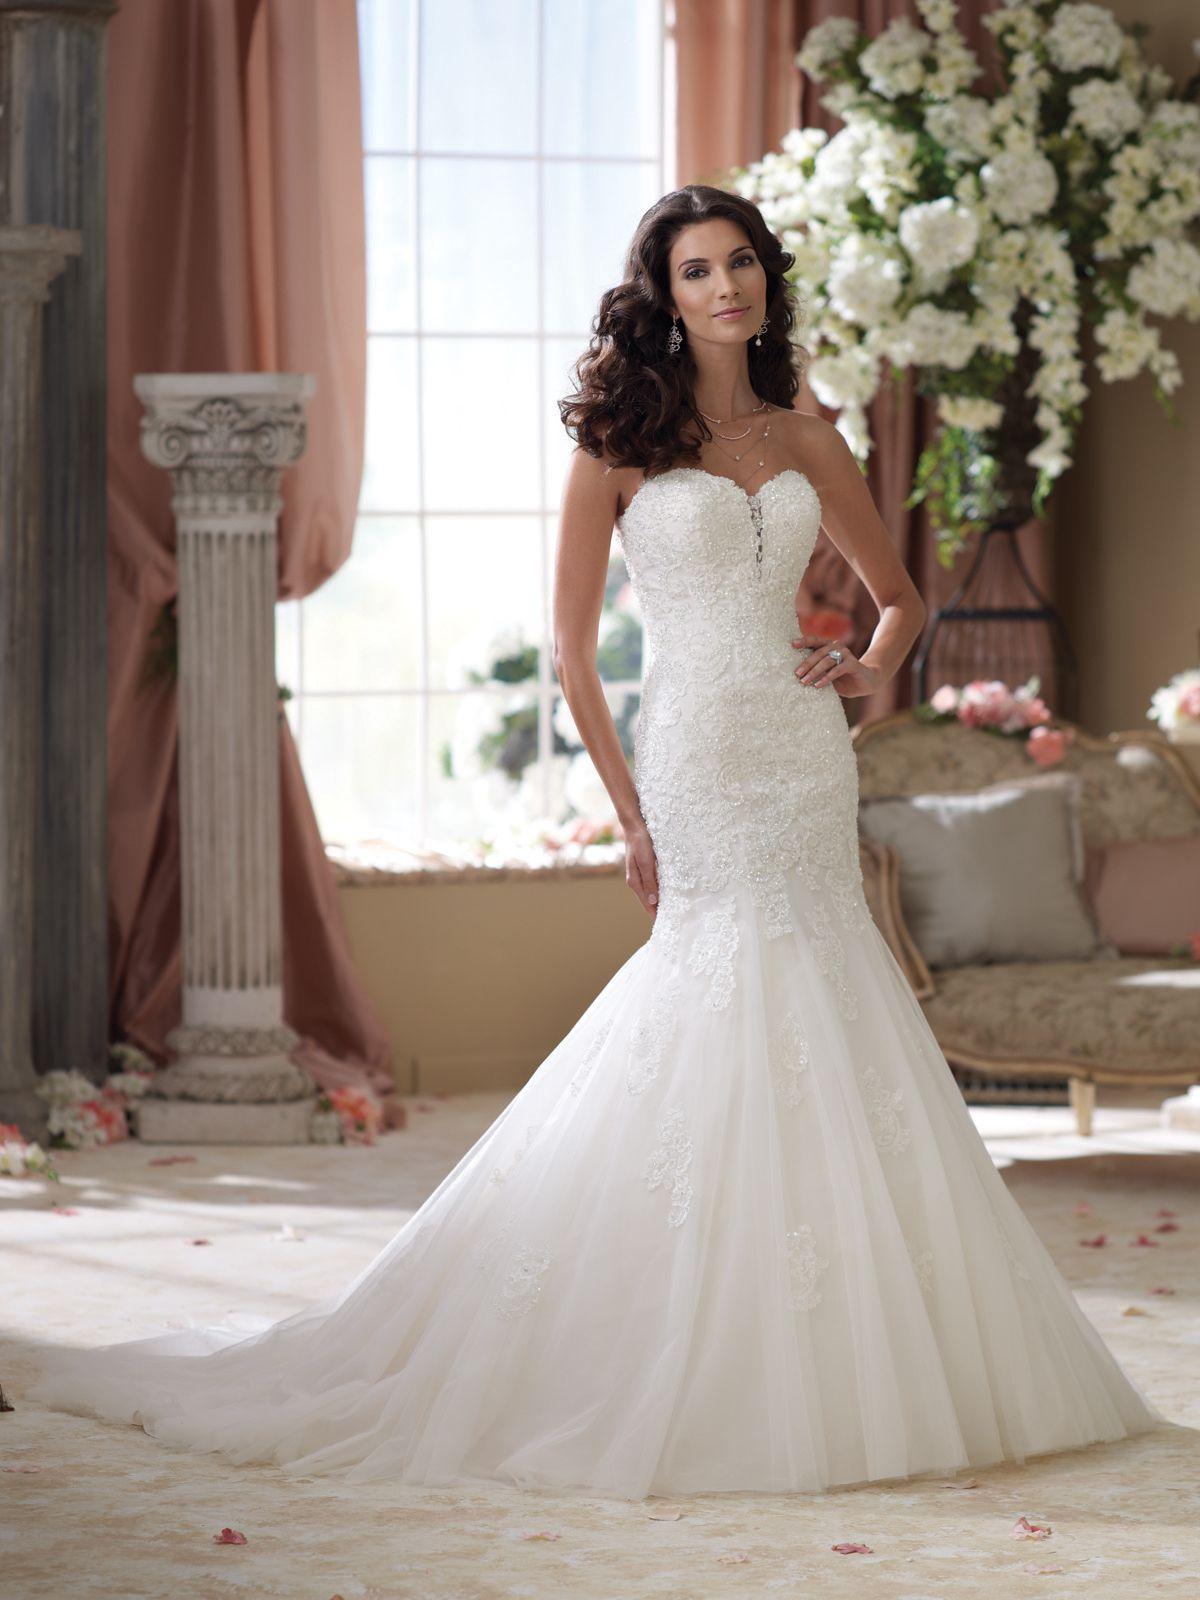 style no 114293 187 david tutera for mon cheri 187 wedding